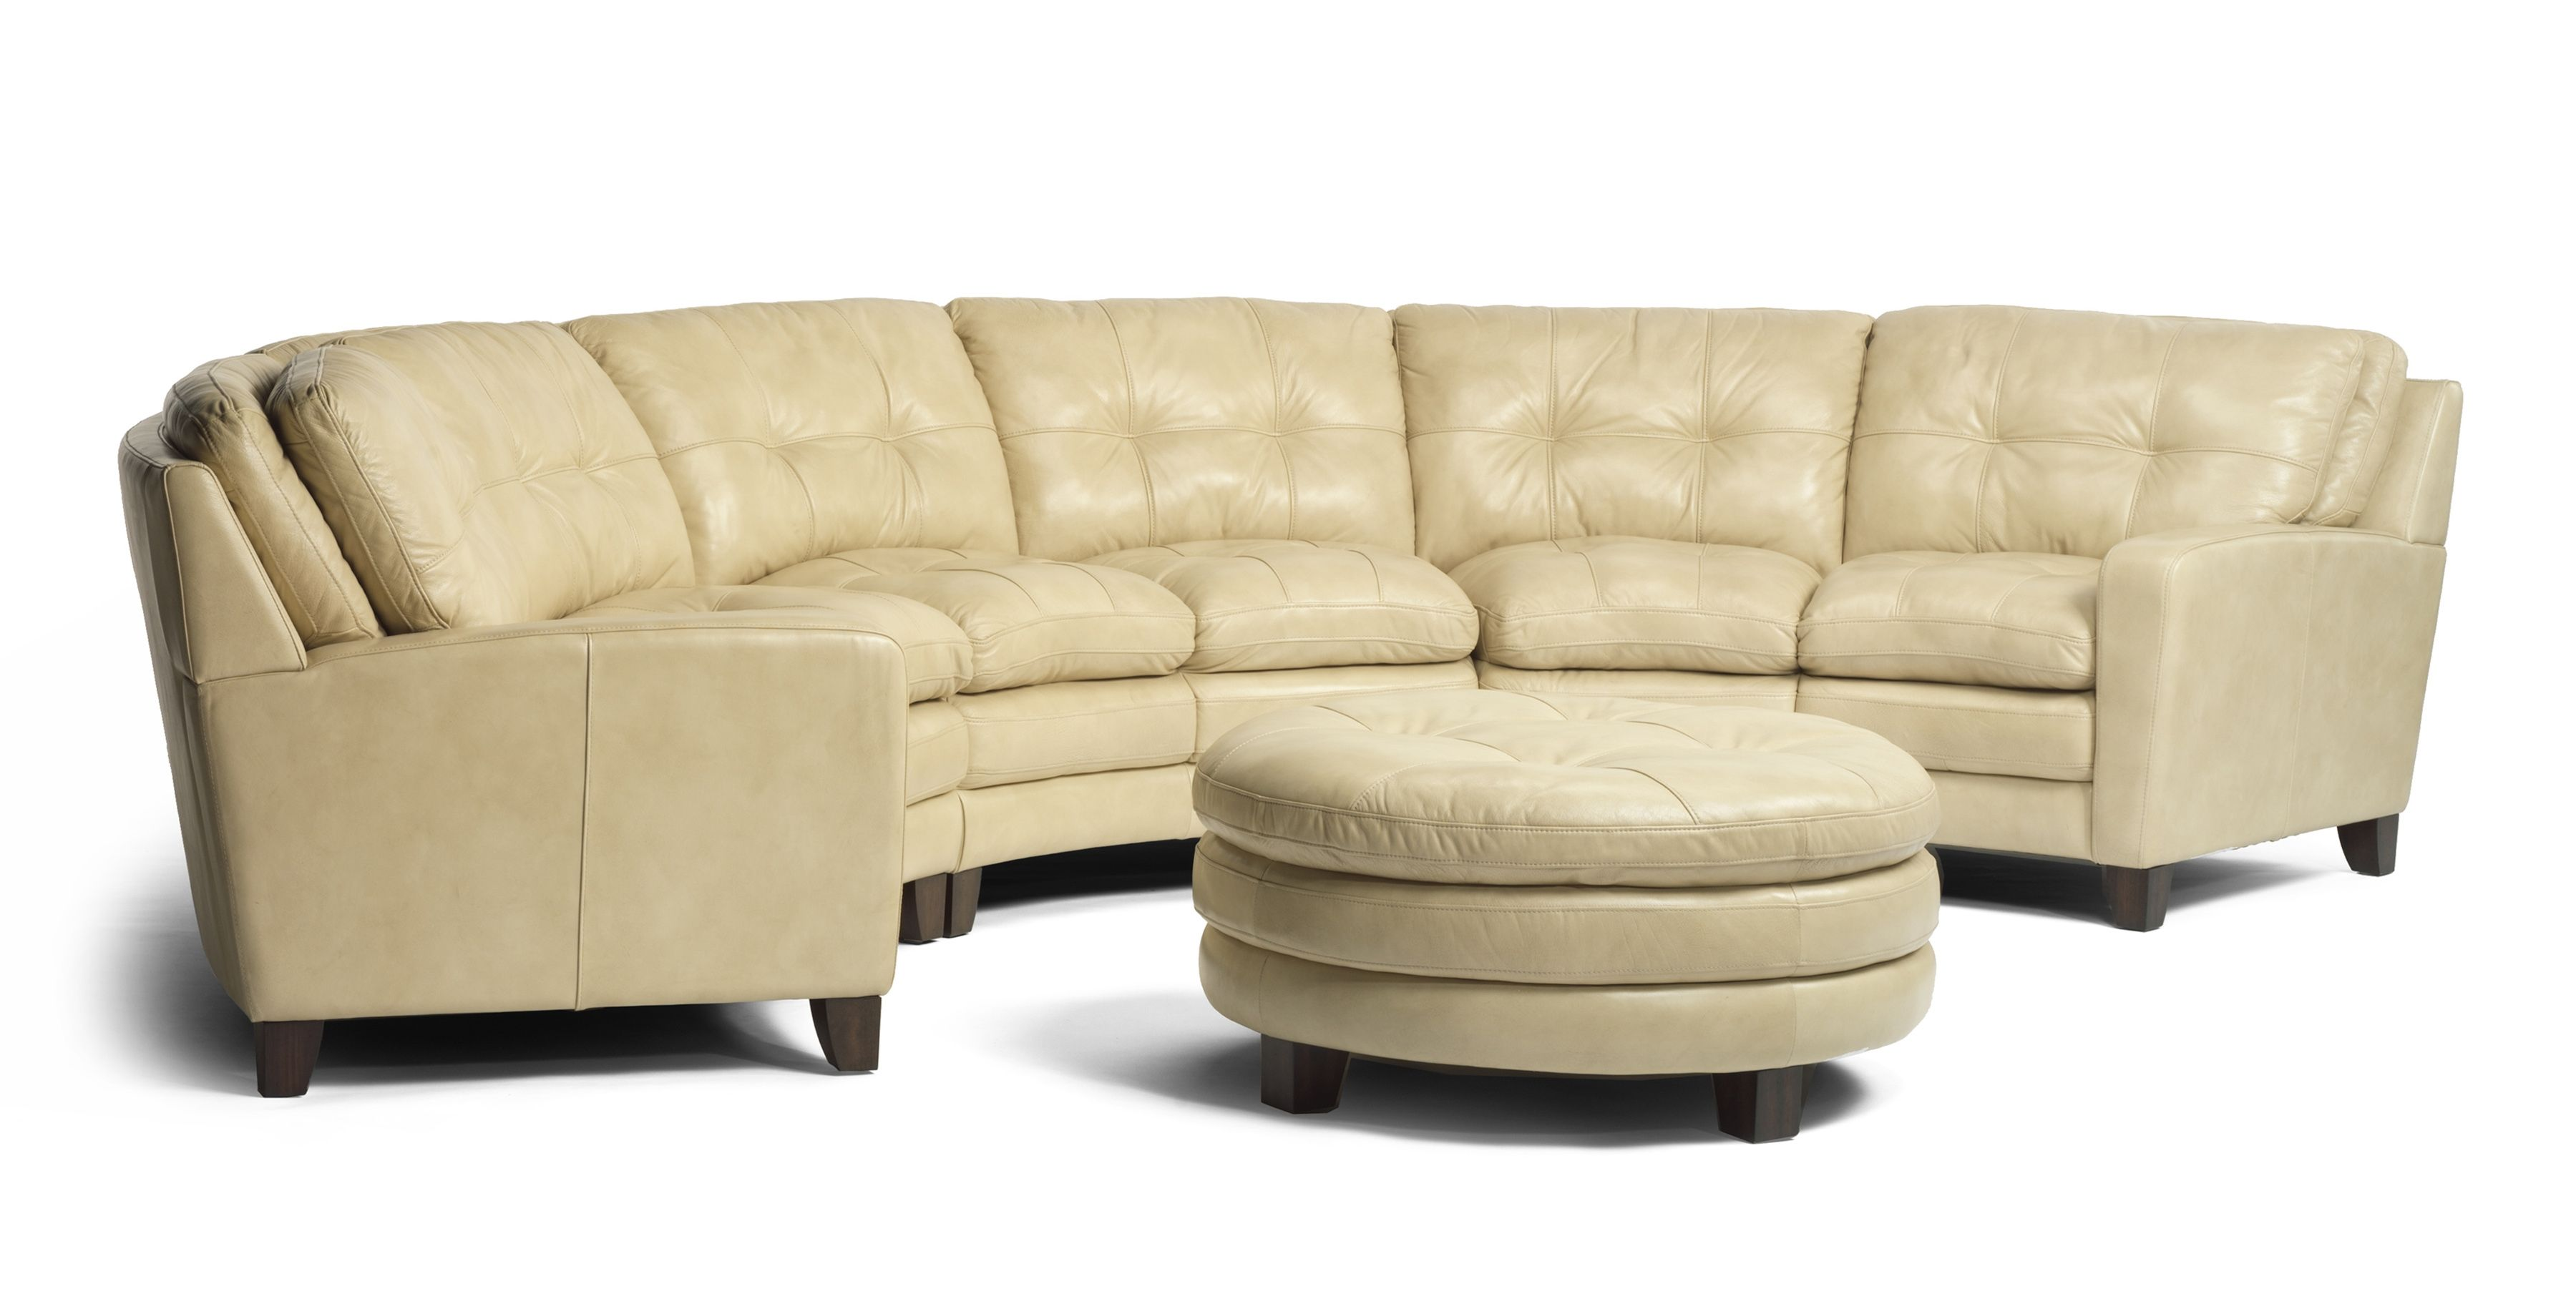 Gorgeous Cream Leather Conversation Sofa. Www.awfurniture